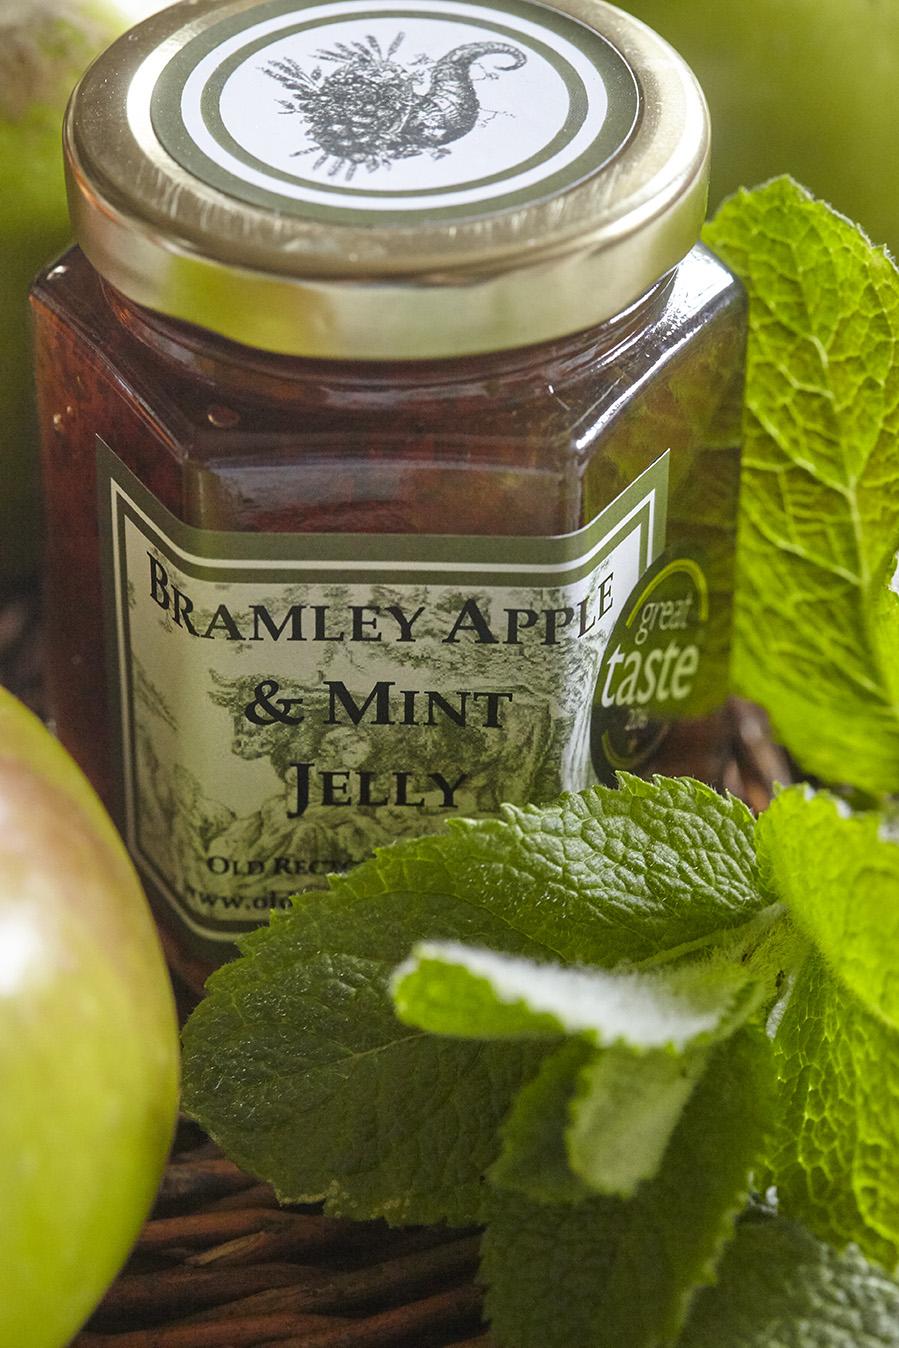 Bramley Apple & Mint